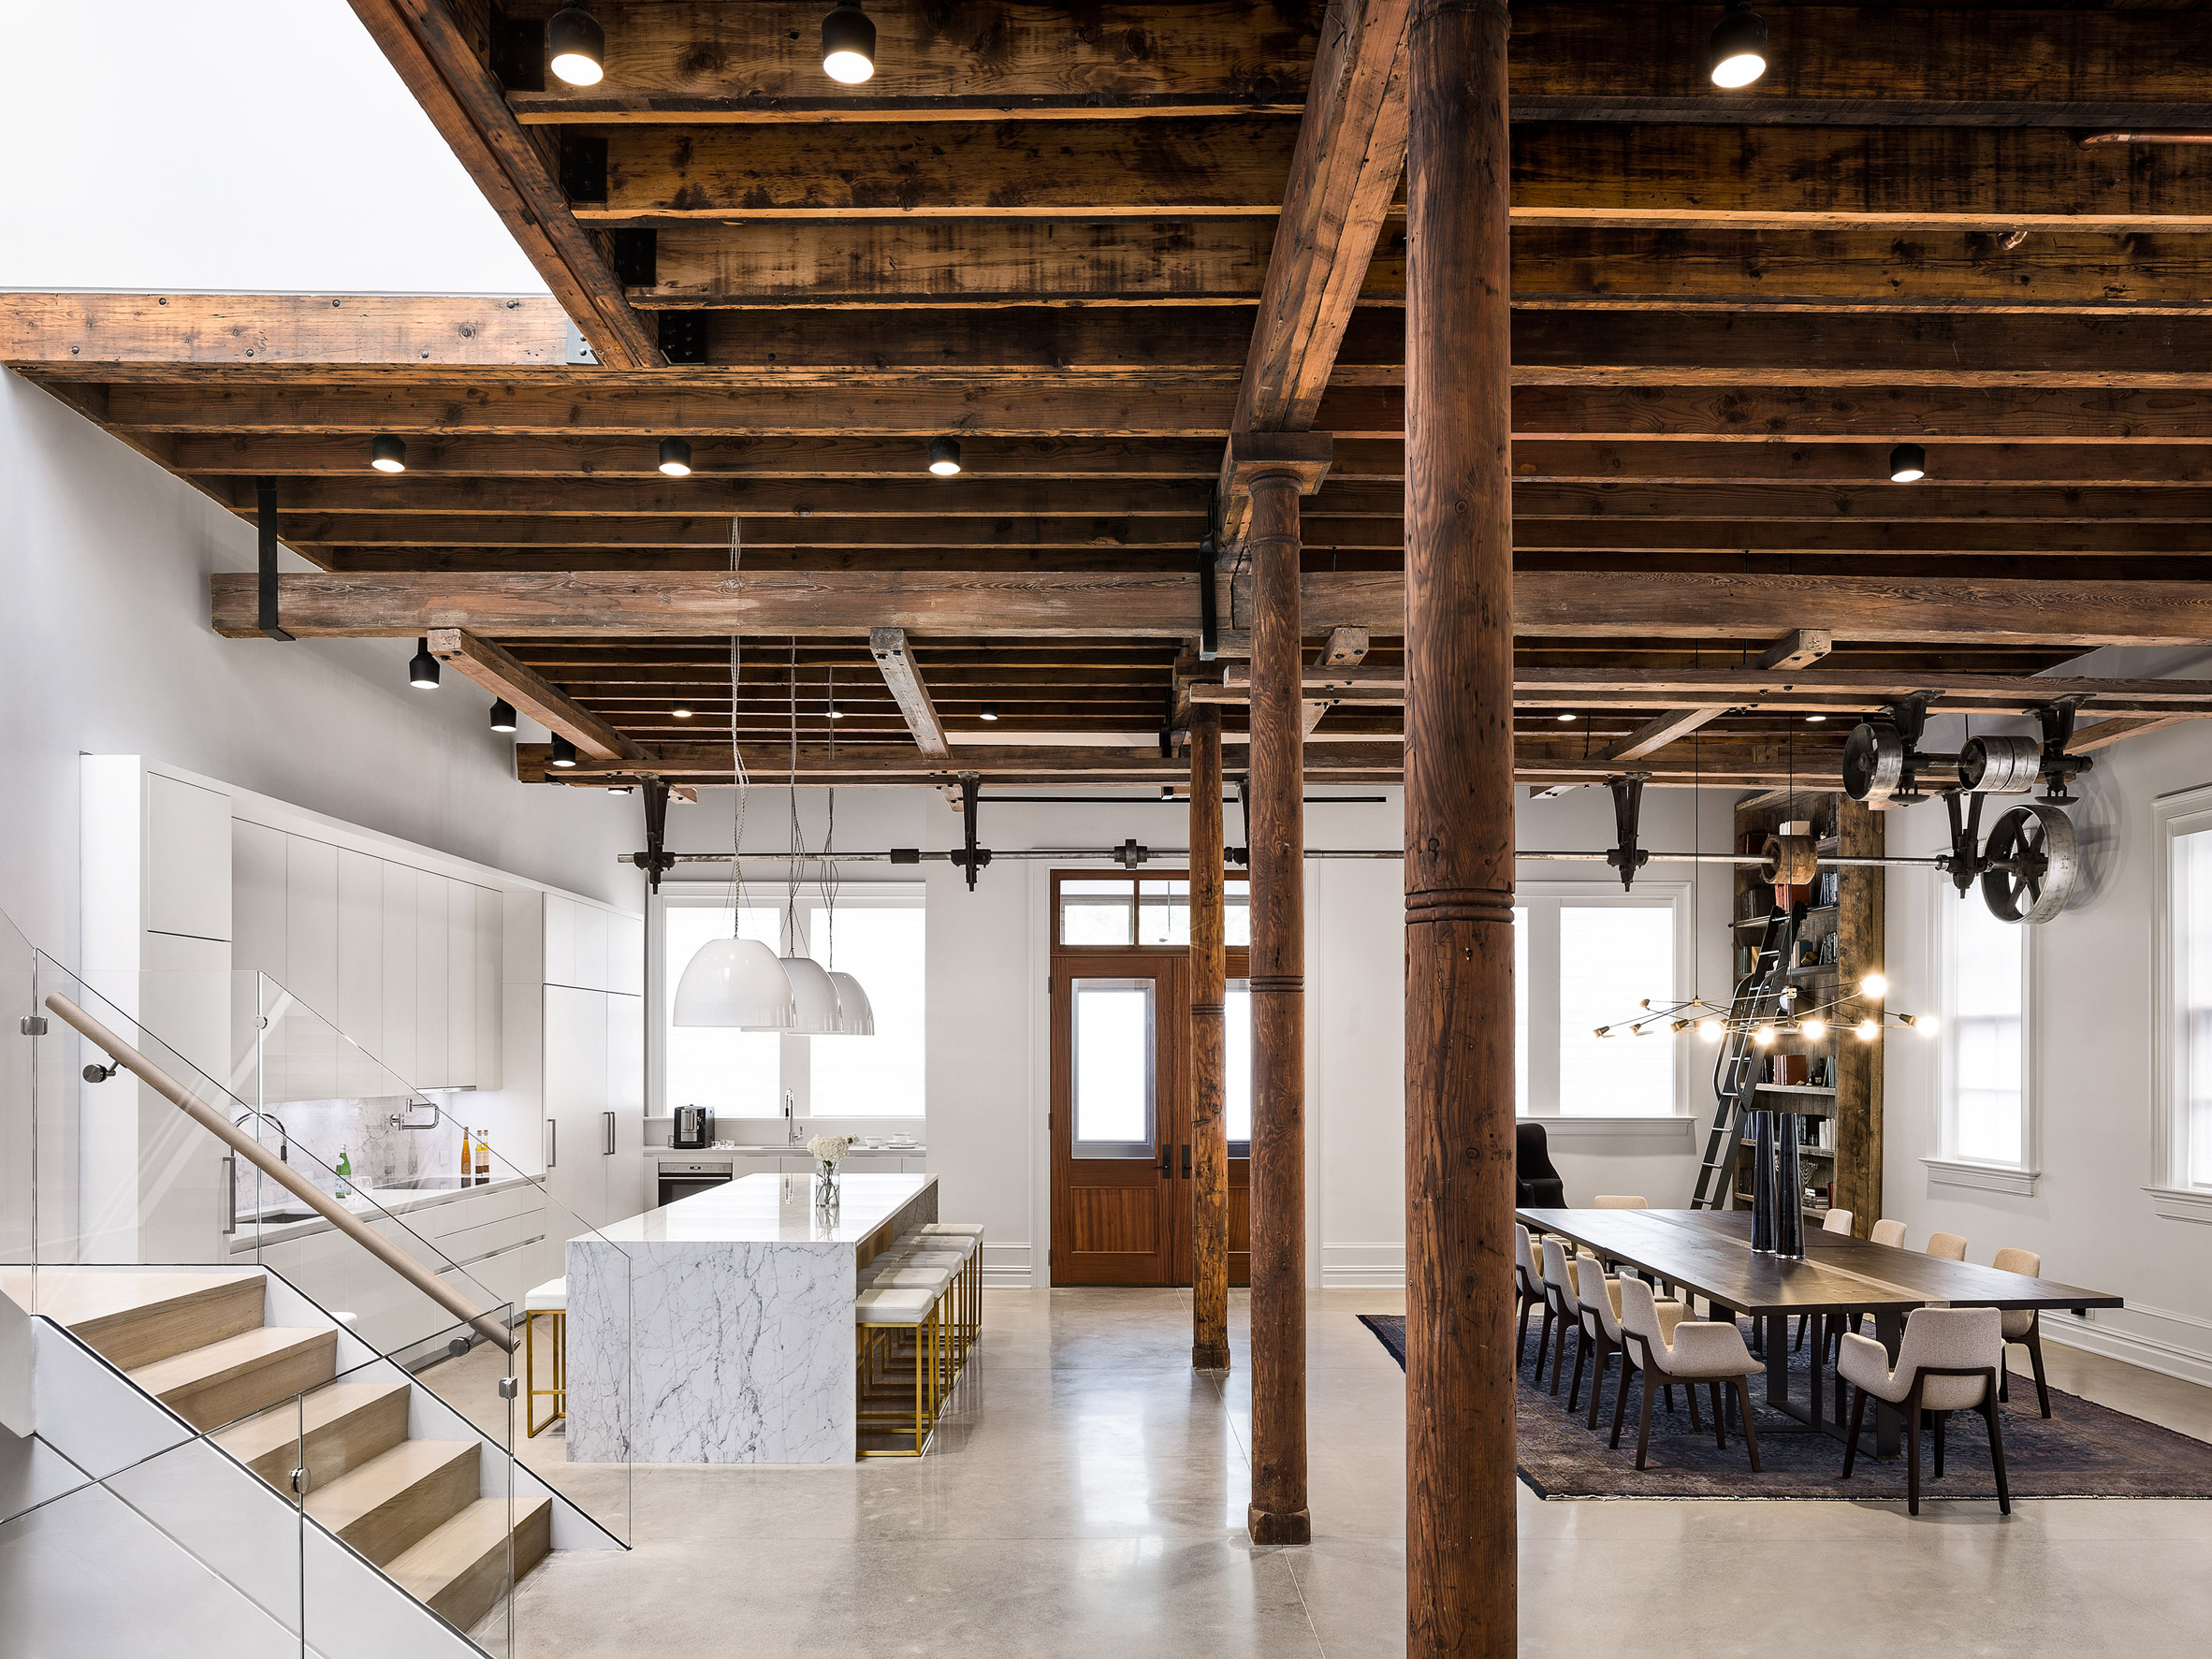 paulus-hook-residence-fogarty-finger-interiors-new-jersey-usa_dezeen_2364_col_2.jpg